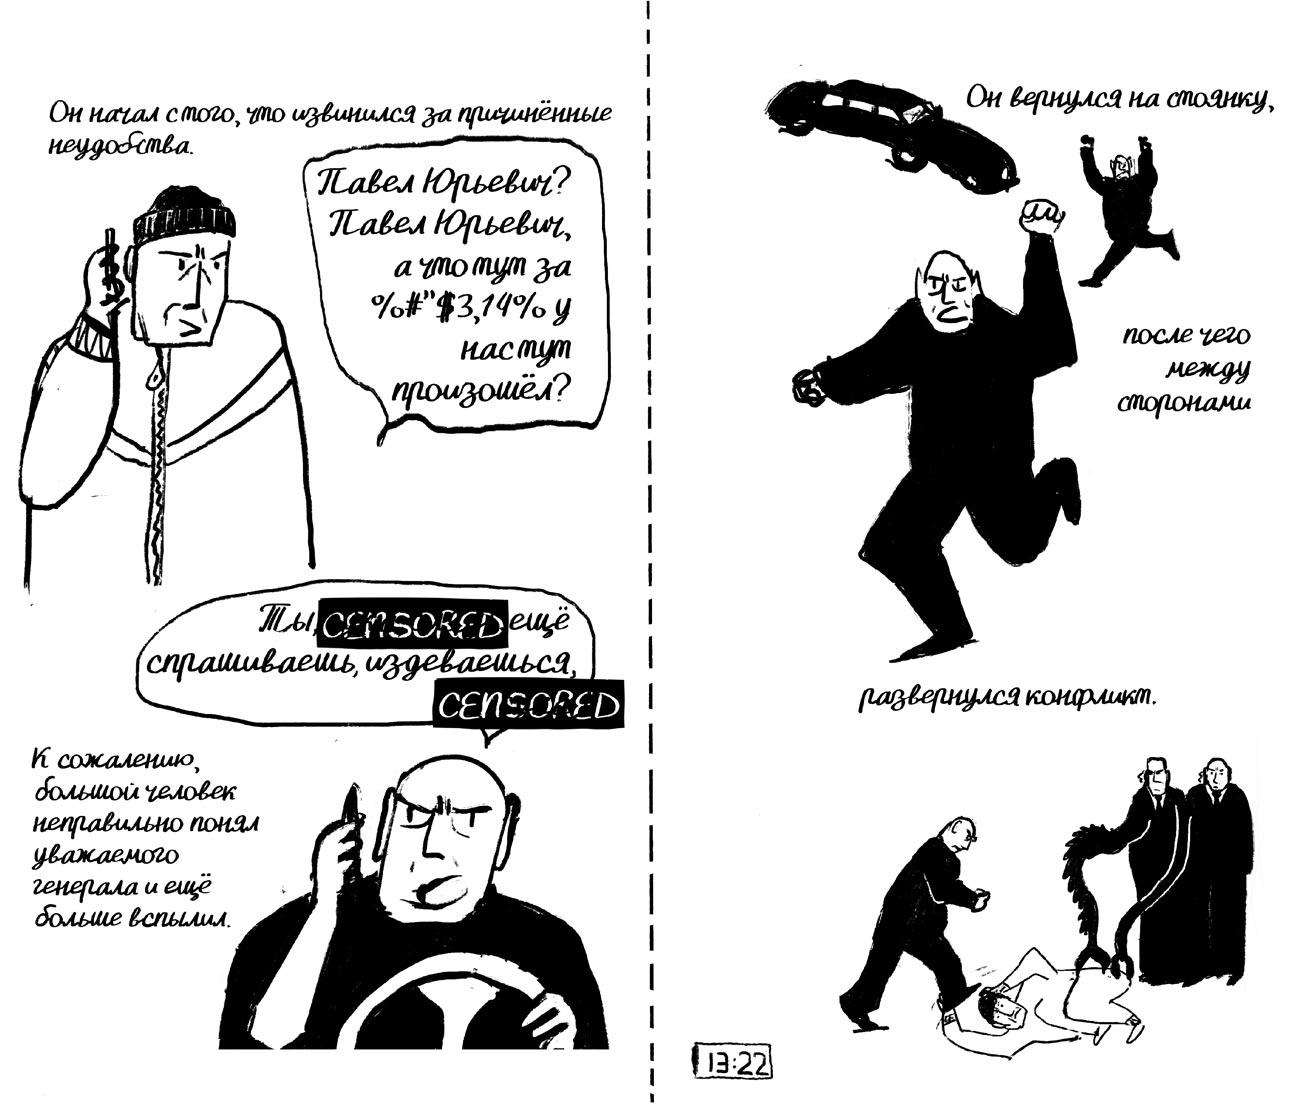 comisc yard 08 - <b>Драма на парковке.</b> Комикс Тани Кремень про кумовство и коррупцию - Заборона